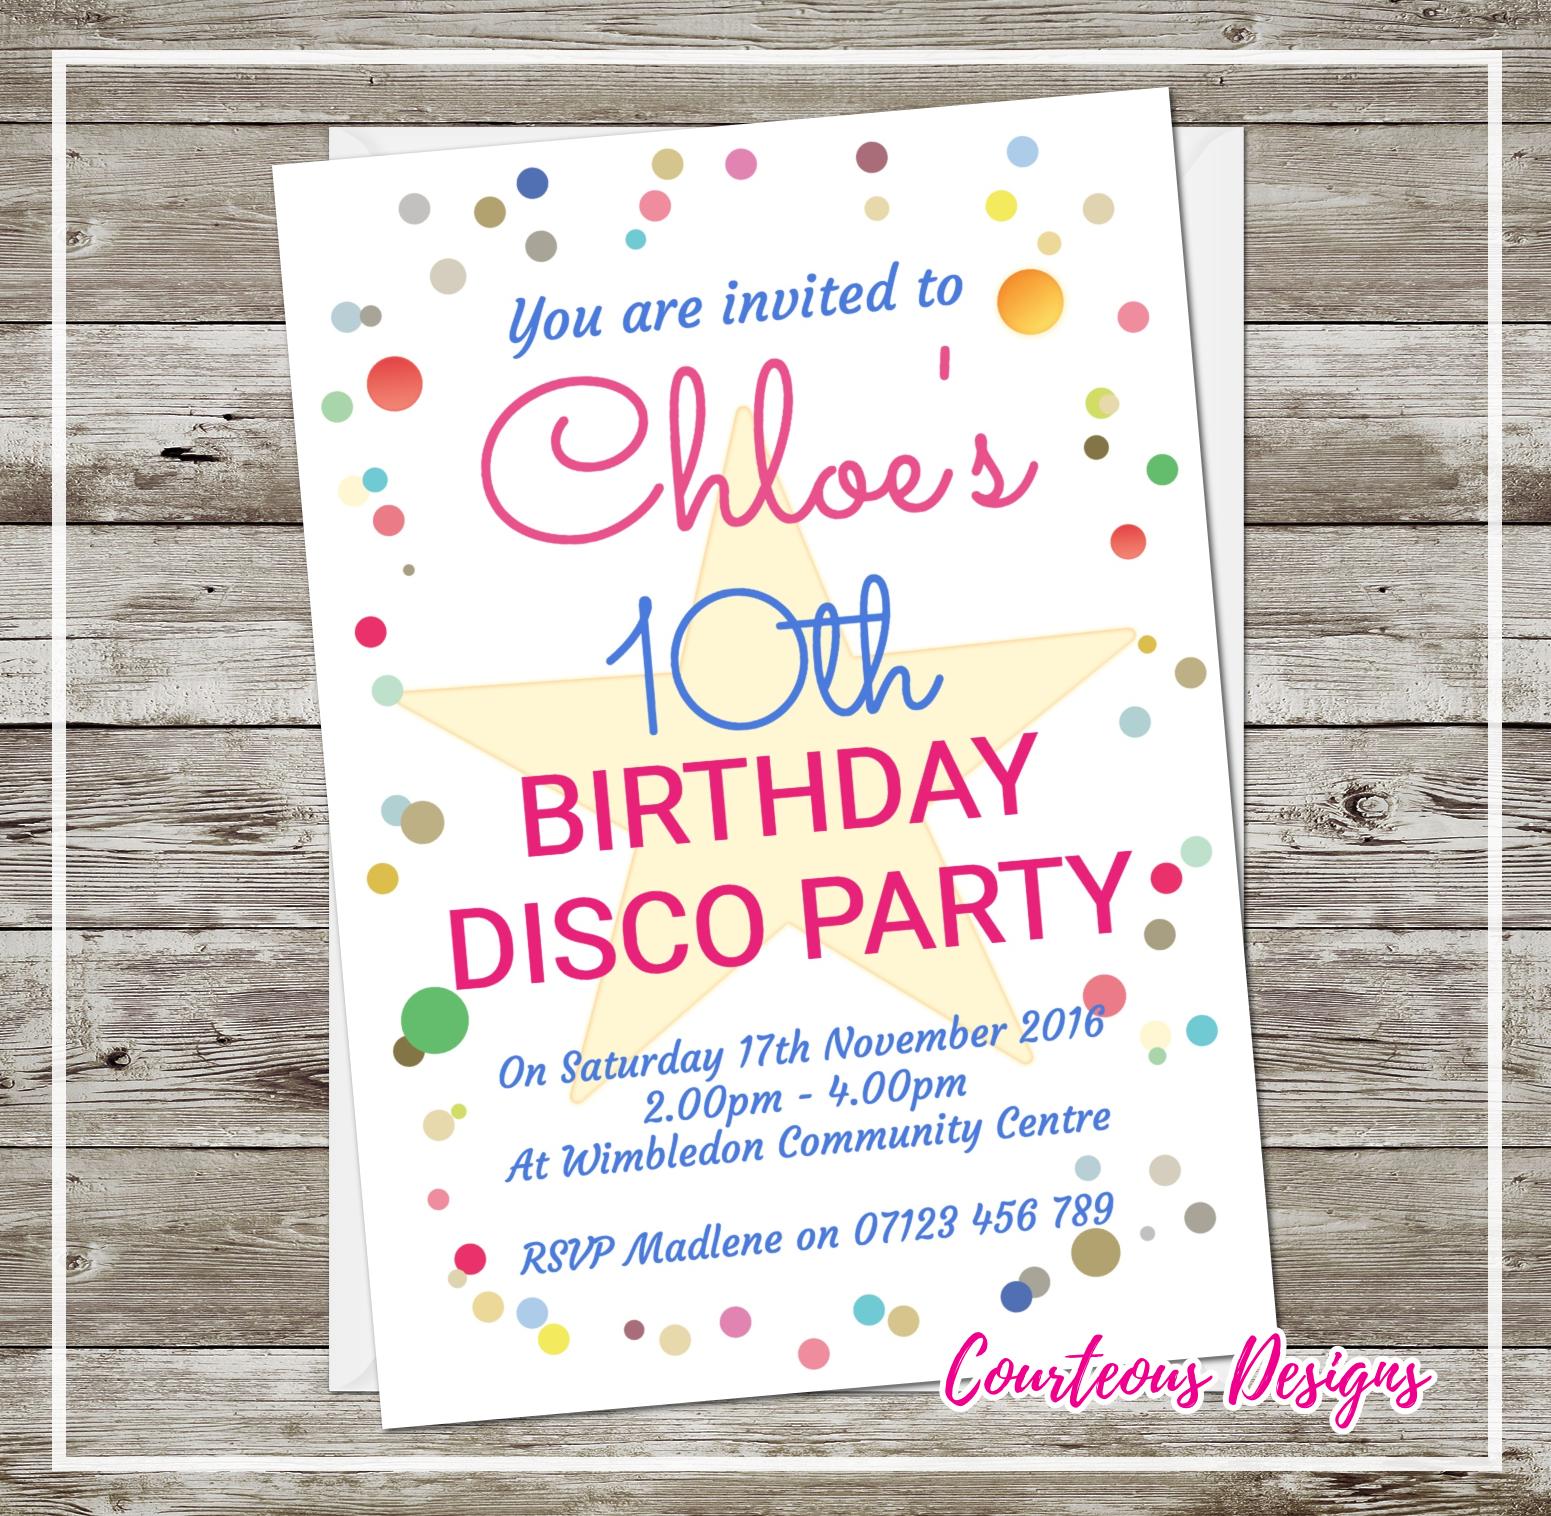 Dotty disco party invitations suavecards stopboris Choice Image